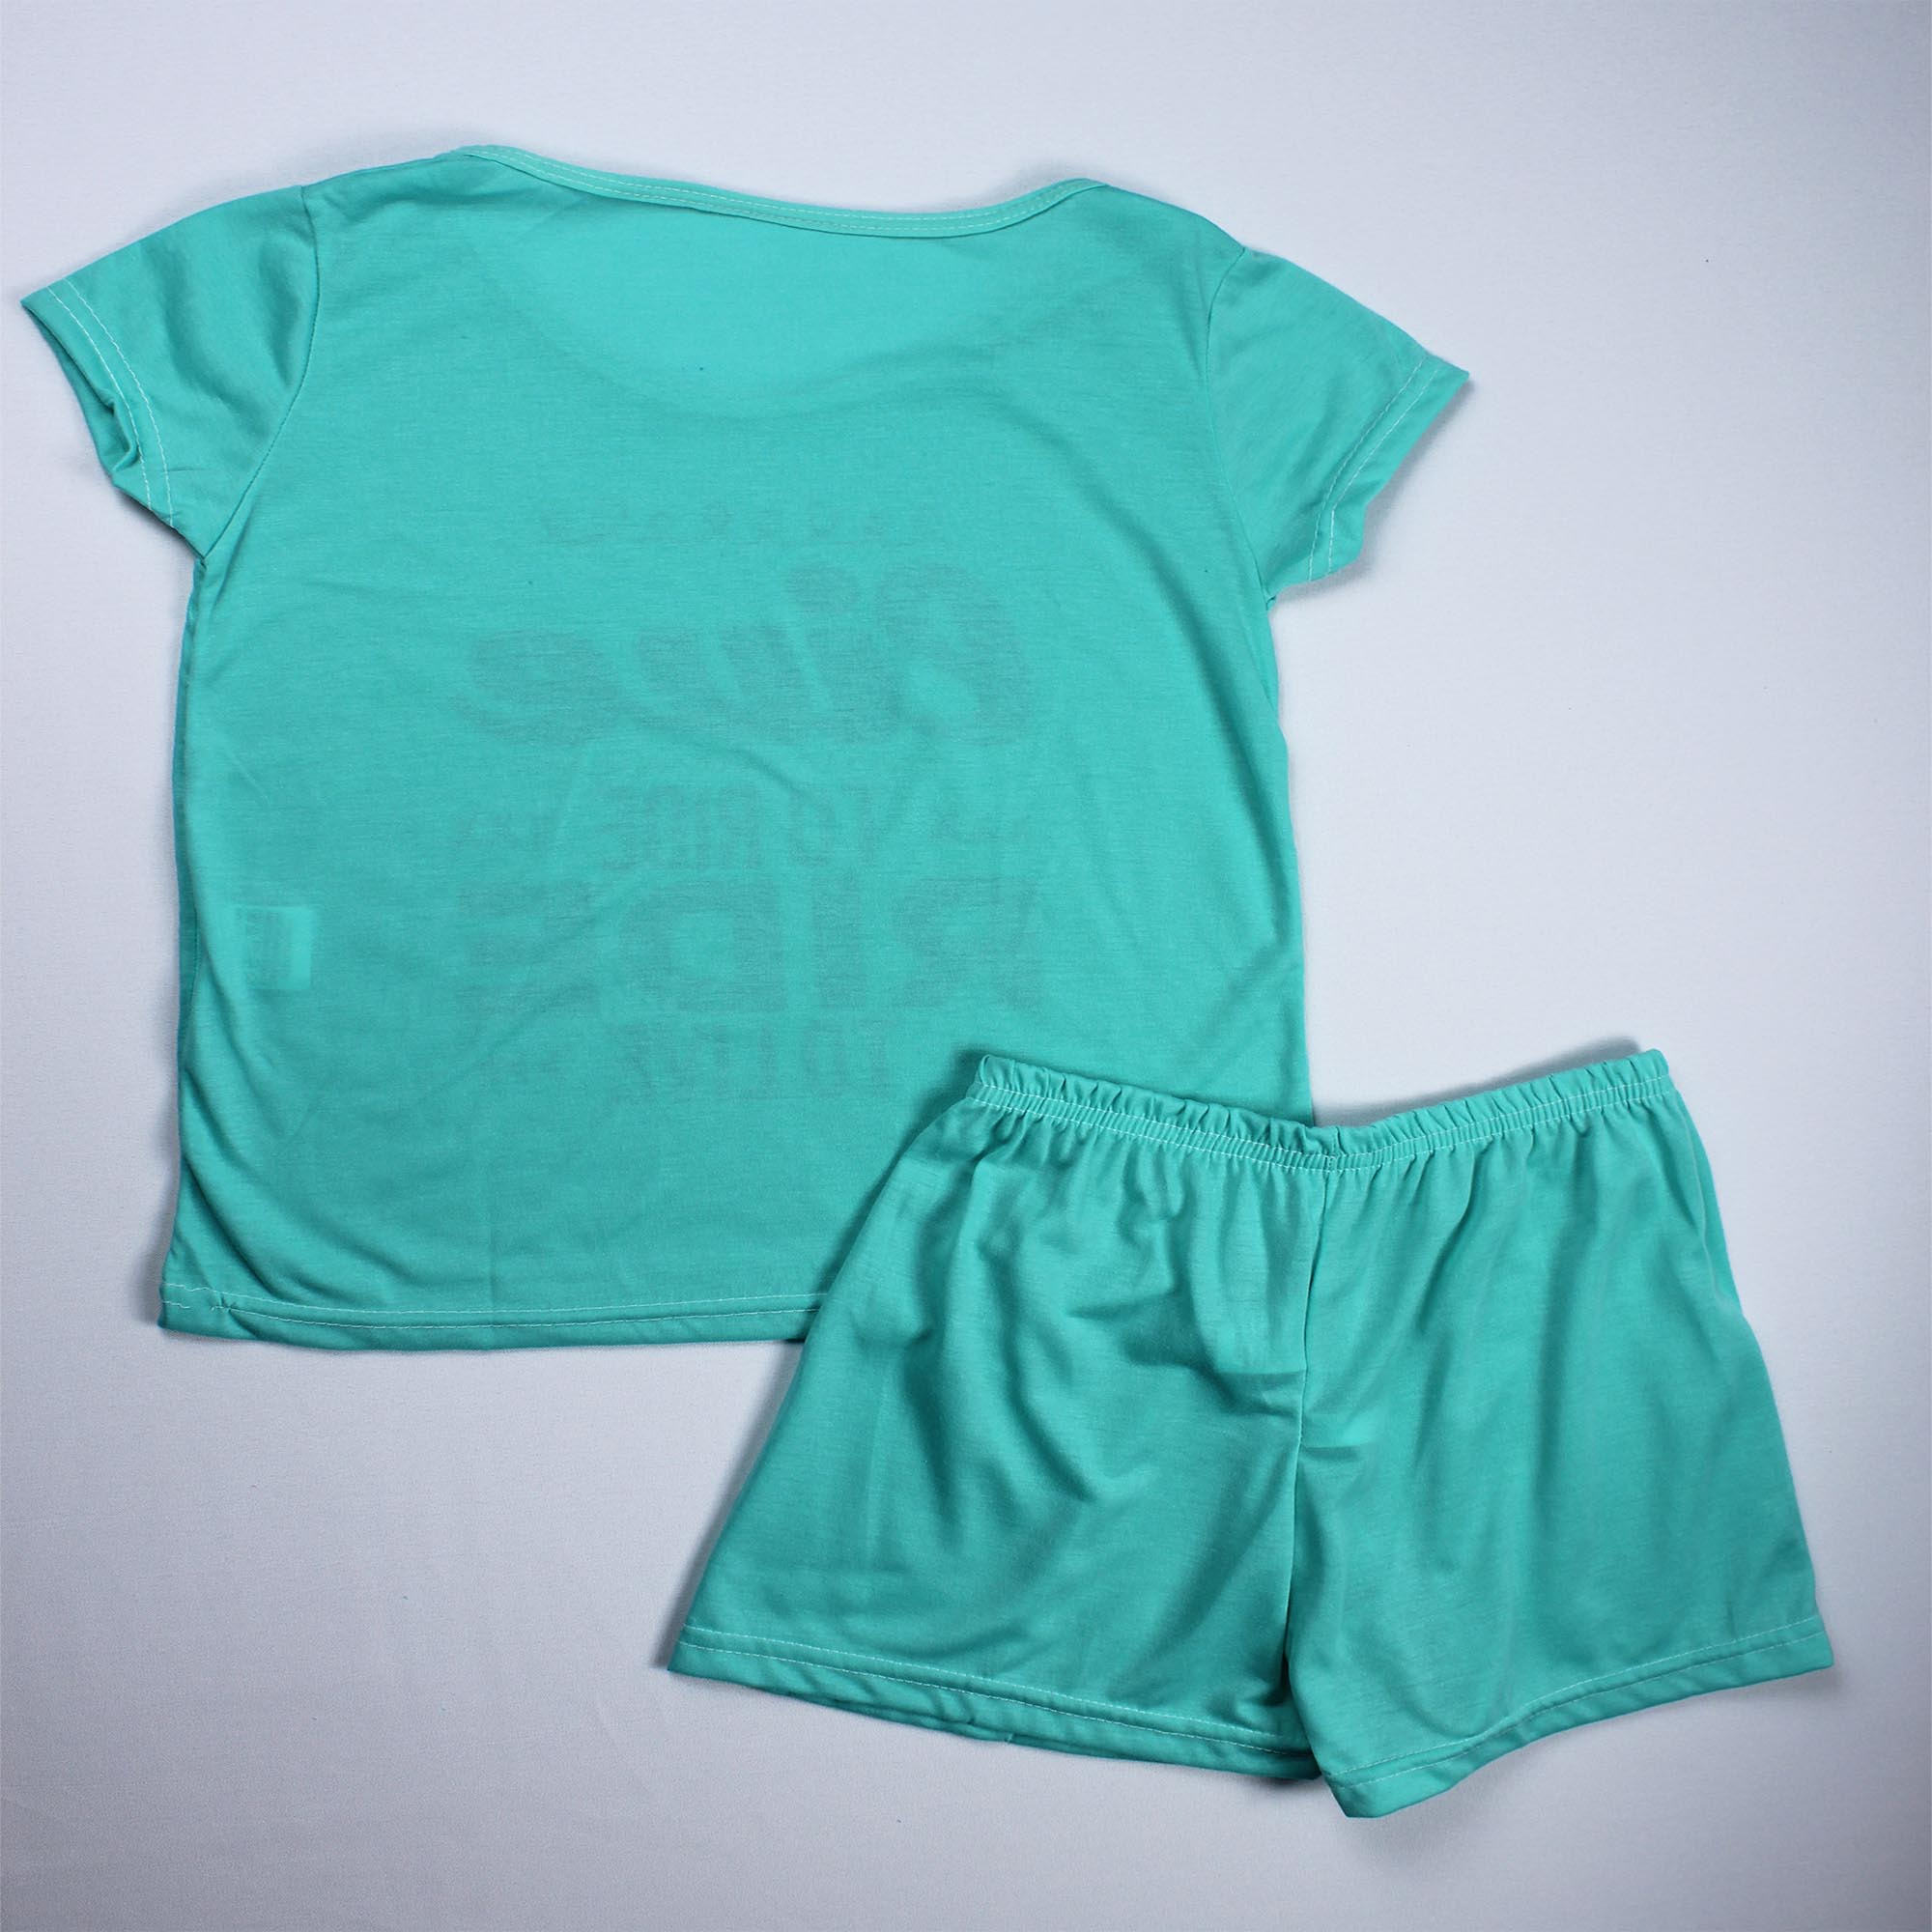 Pijama Infantil Menino - Tamanho 14